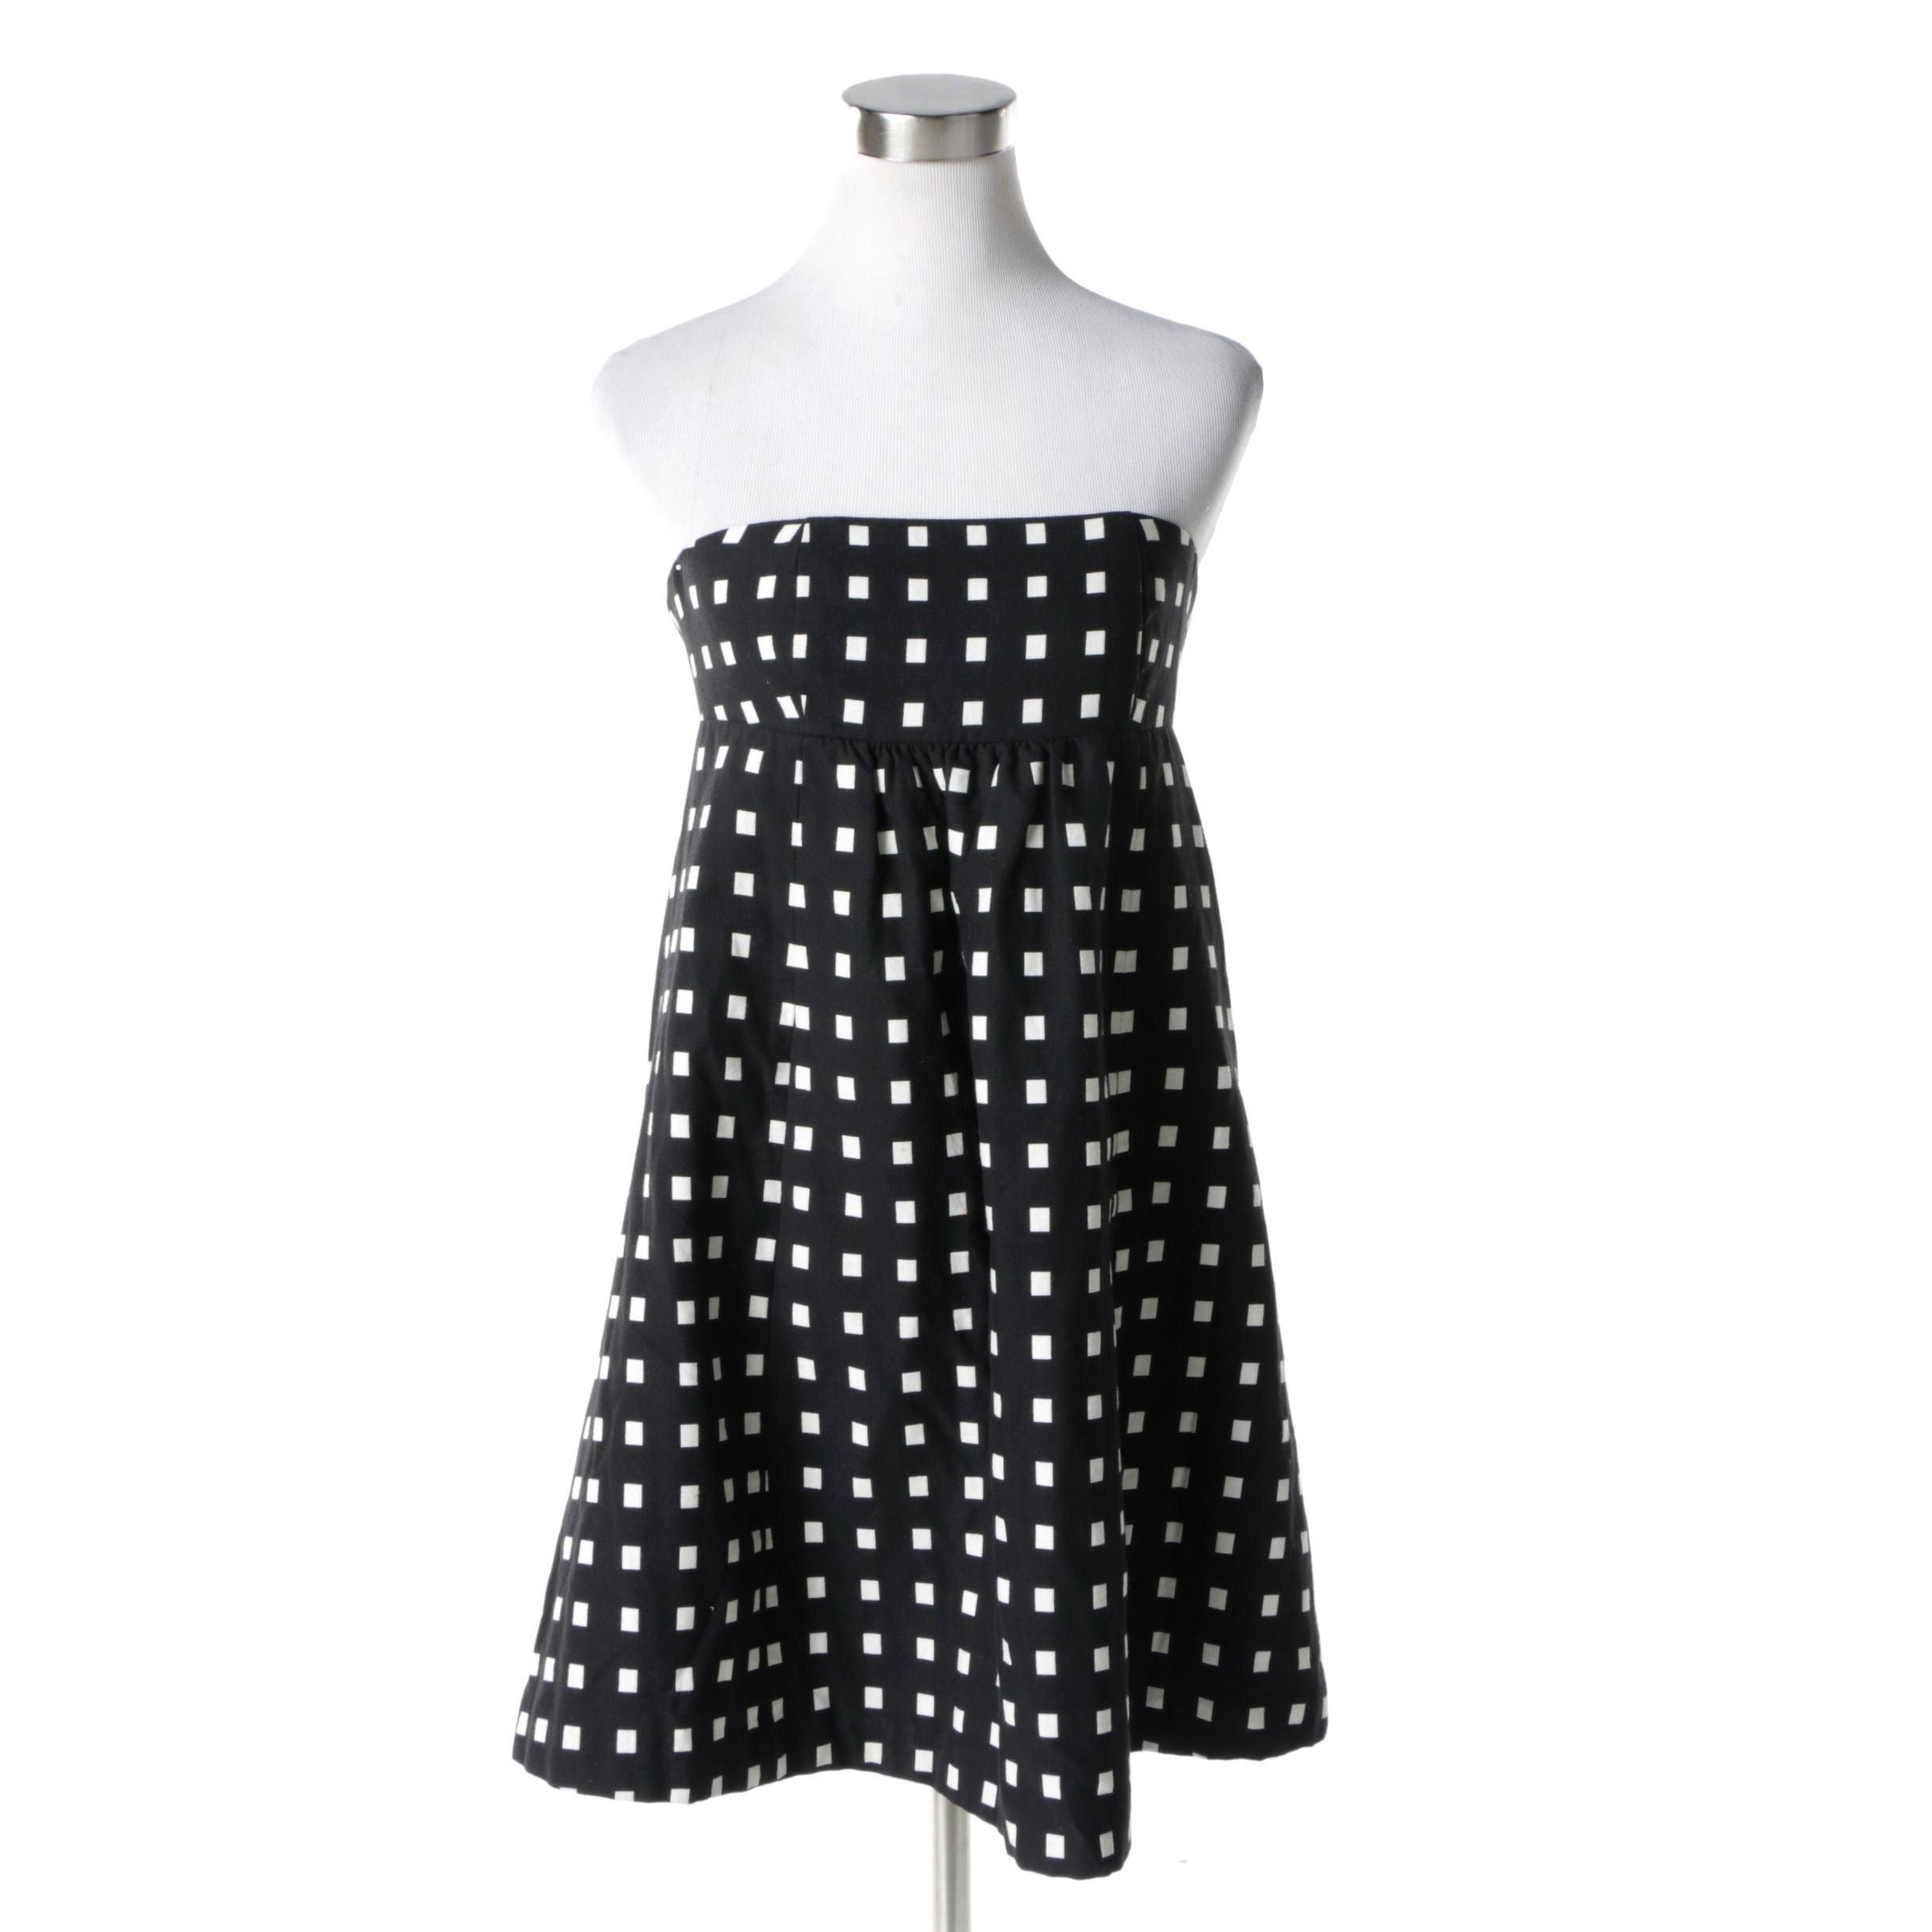 Tibi New York Strapless Dress